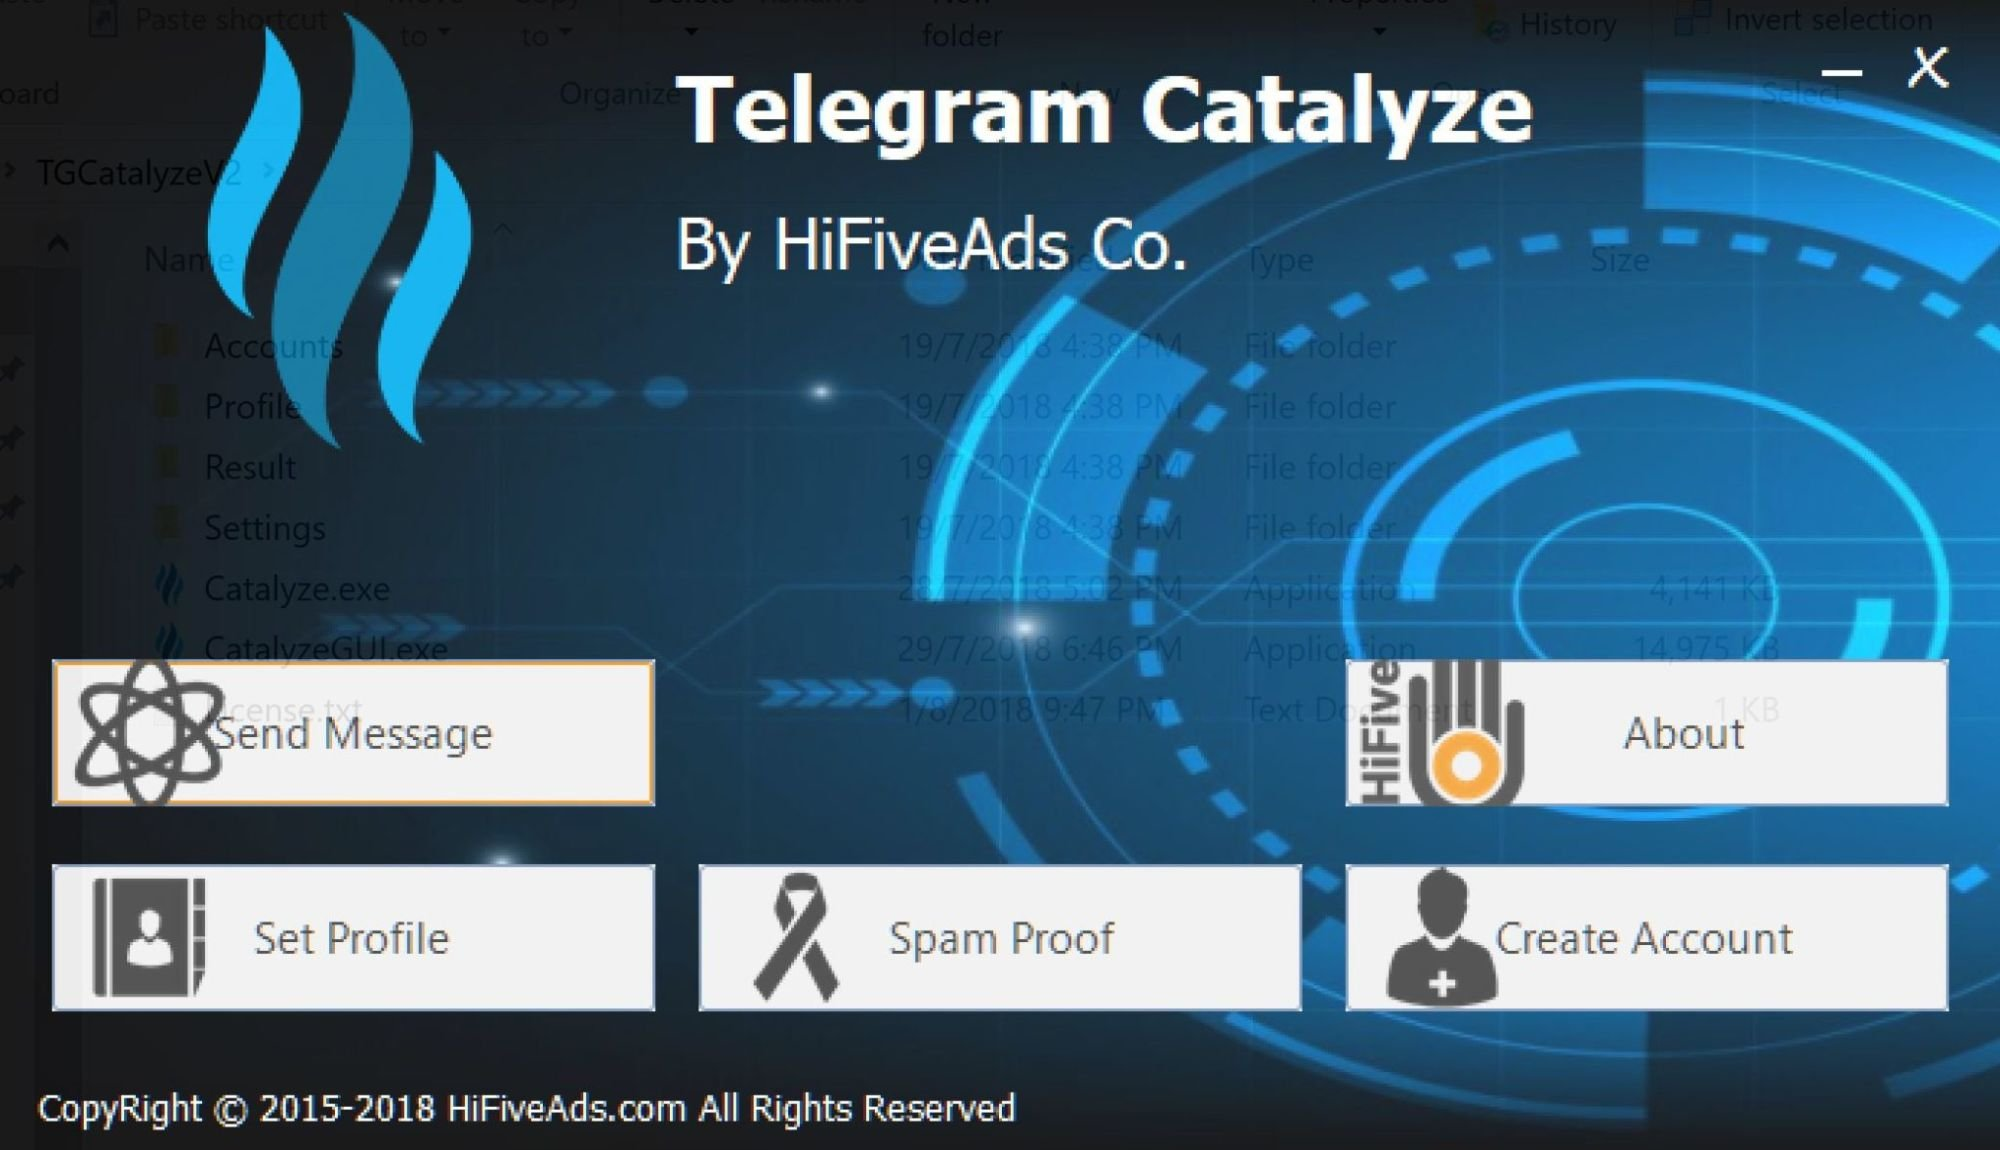 Telegram Catalyz